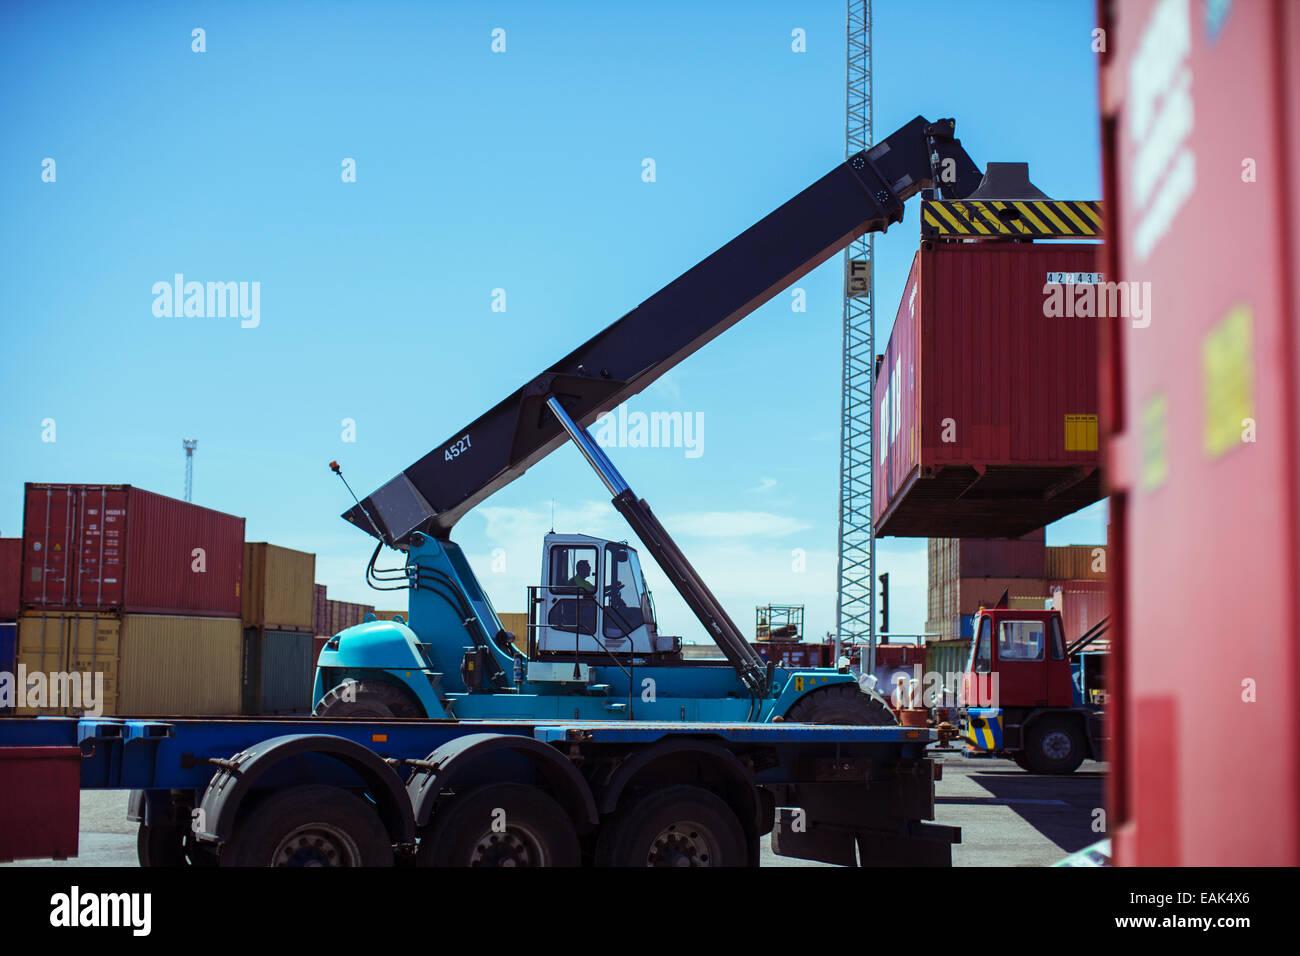 Crane lifting cargo container - Stock Image